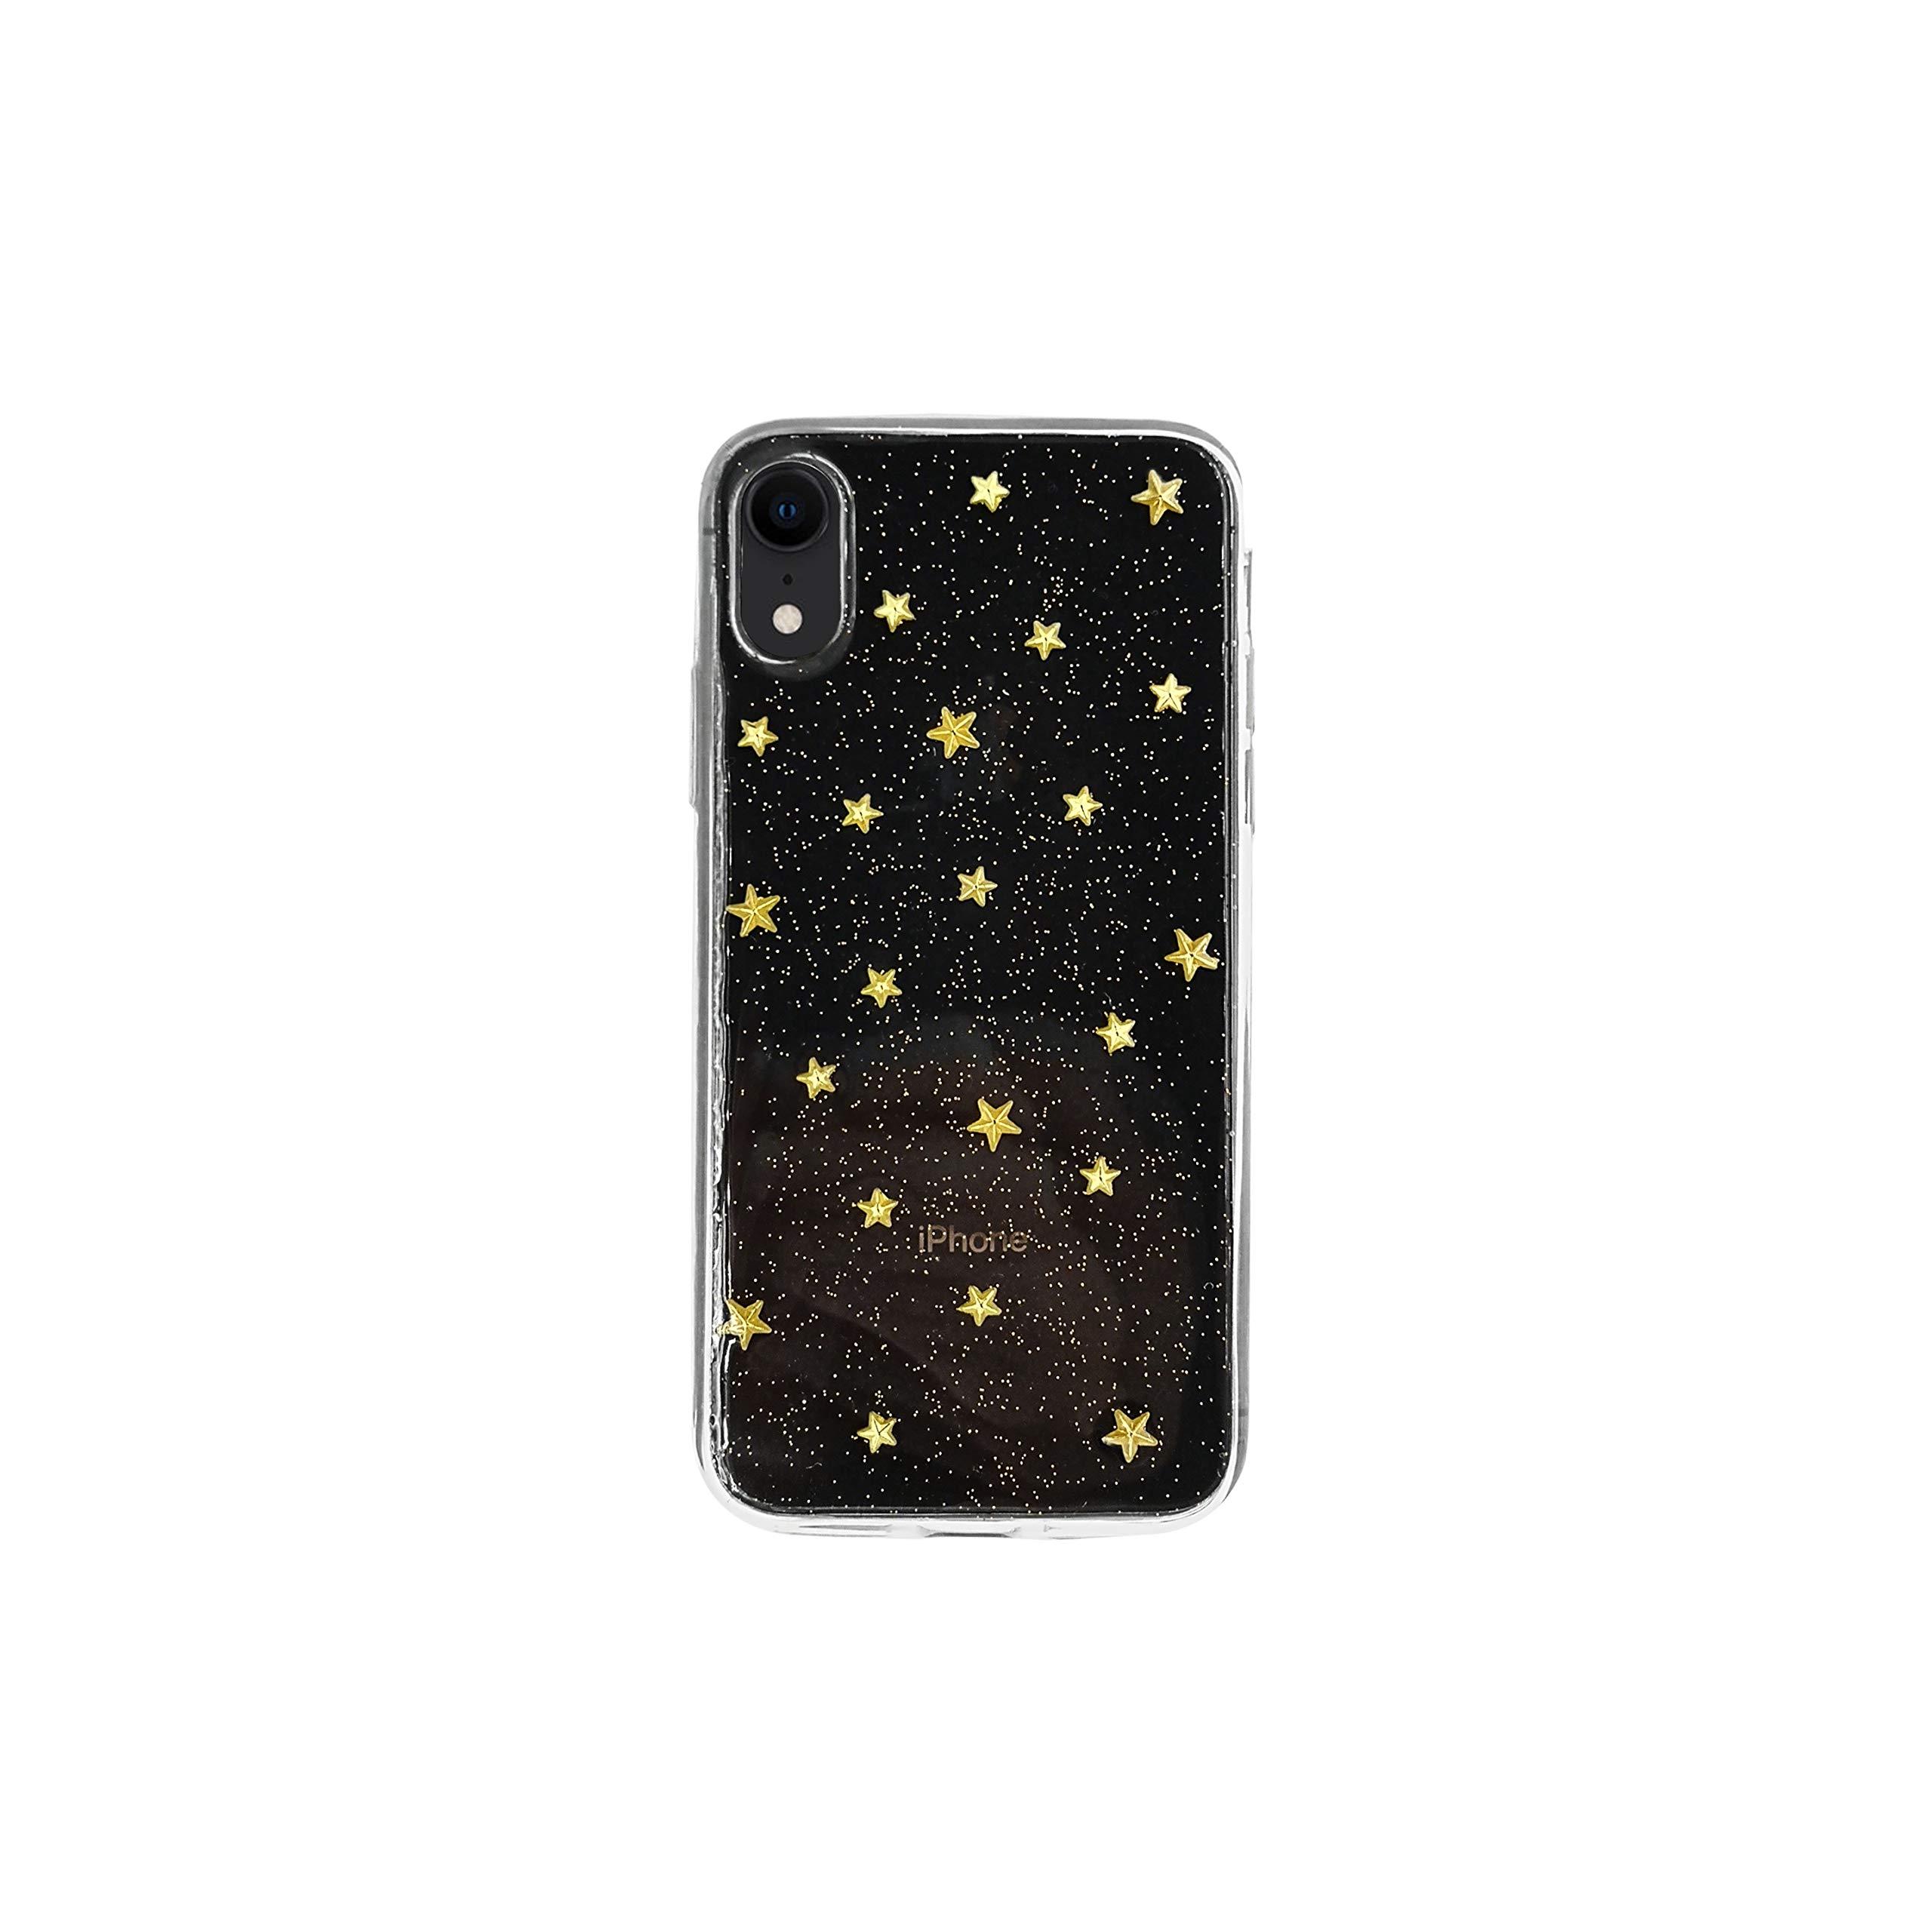 Funda para Iphone Xr Glitter HOLASTAR (7QKTRWL4)